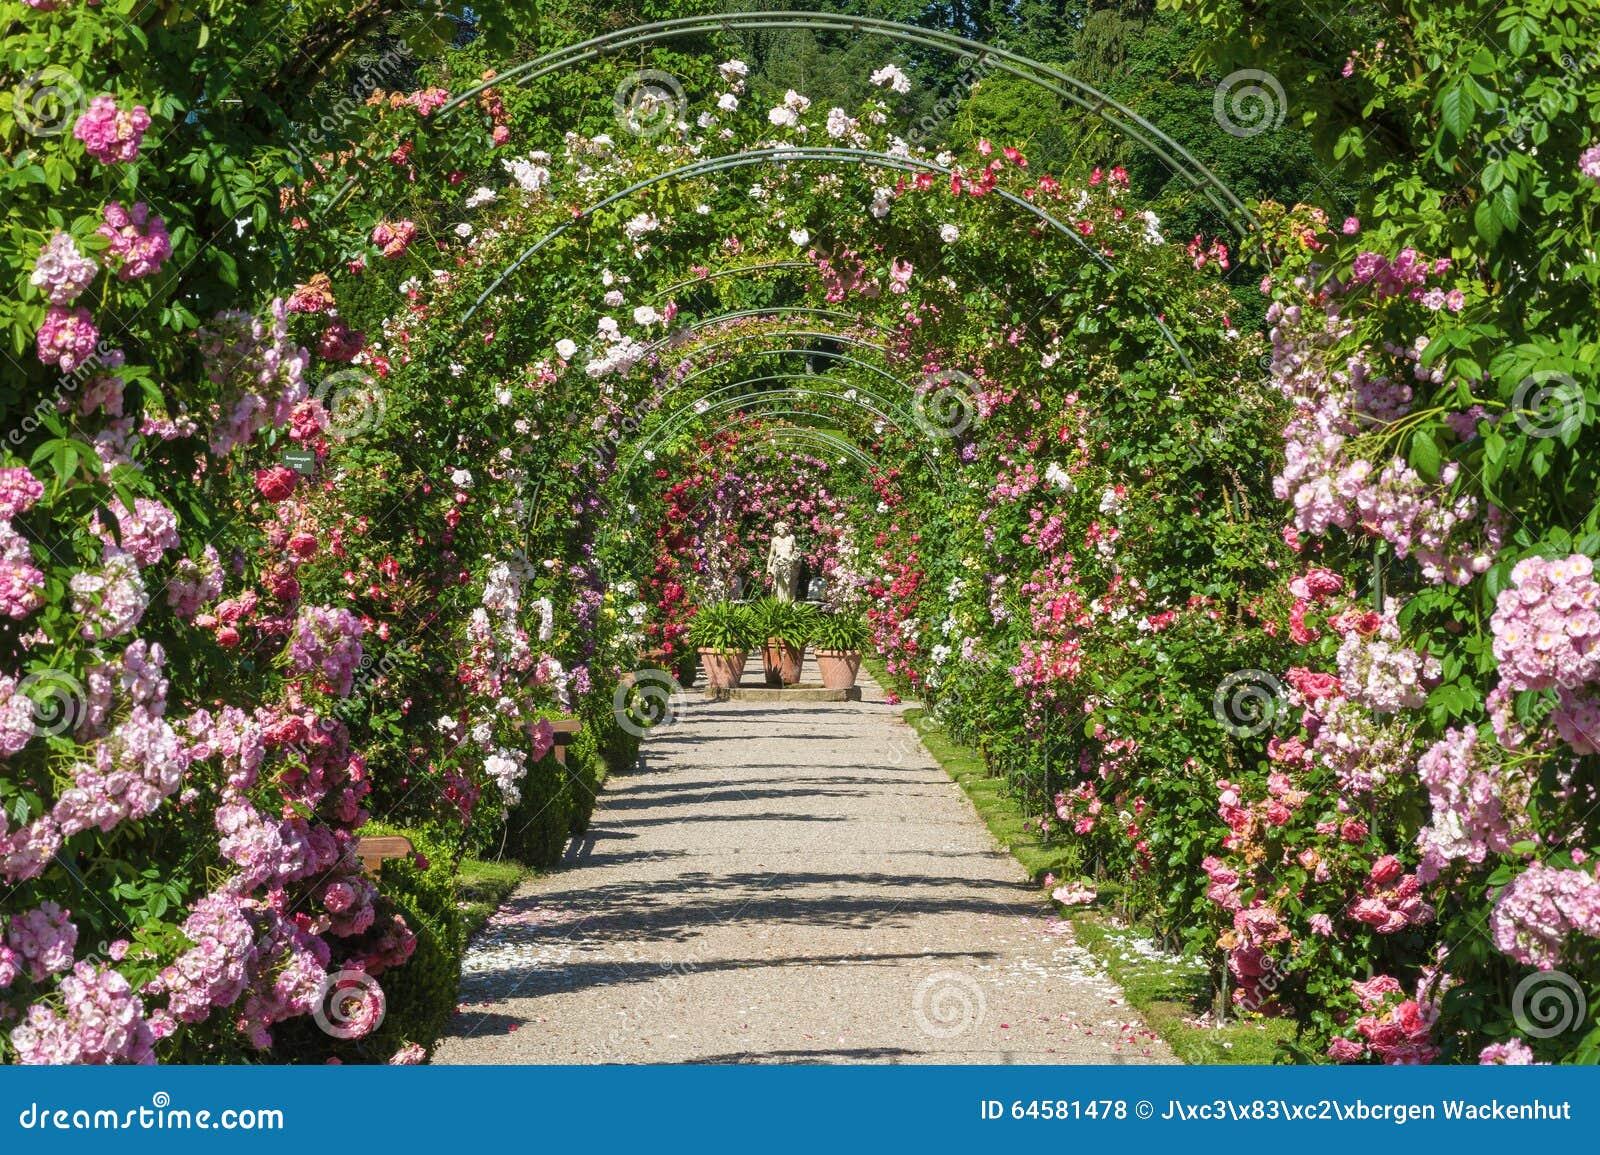 Il roseto Beutig in Baden-Baden